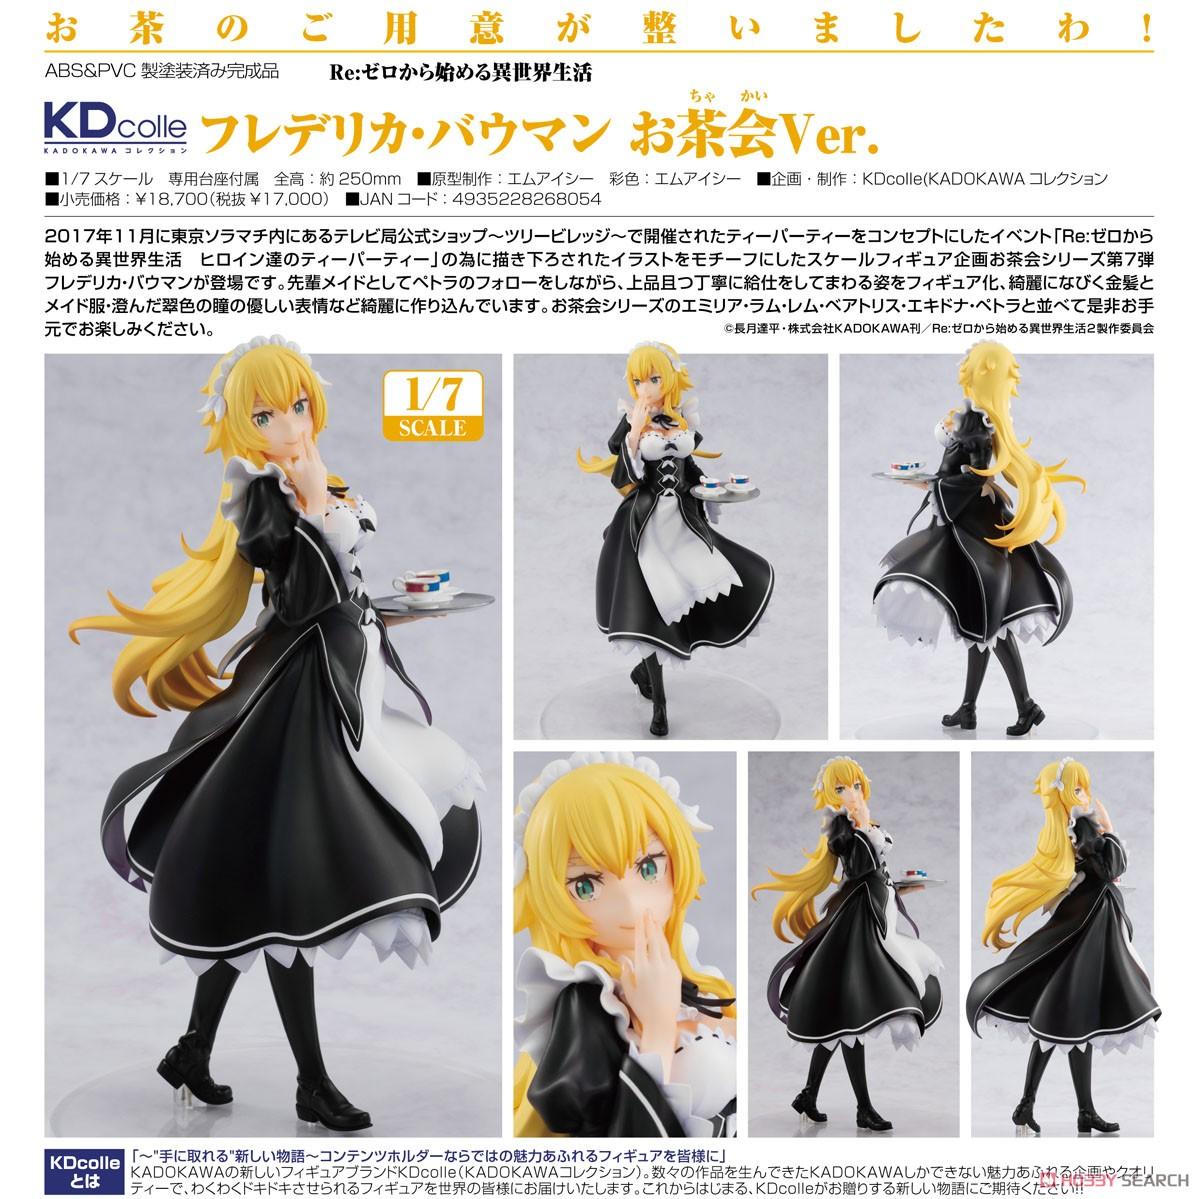 KDcolle『フレデリカ・バウマン お茶会Ver.』Re:ゼロから始める異世界生活 1/7 完成品フィギュア-007